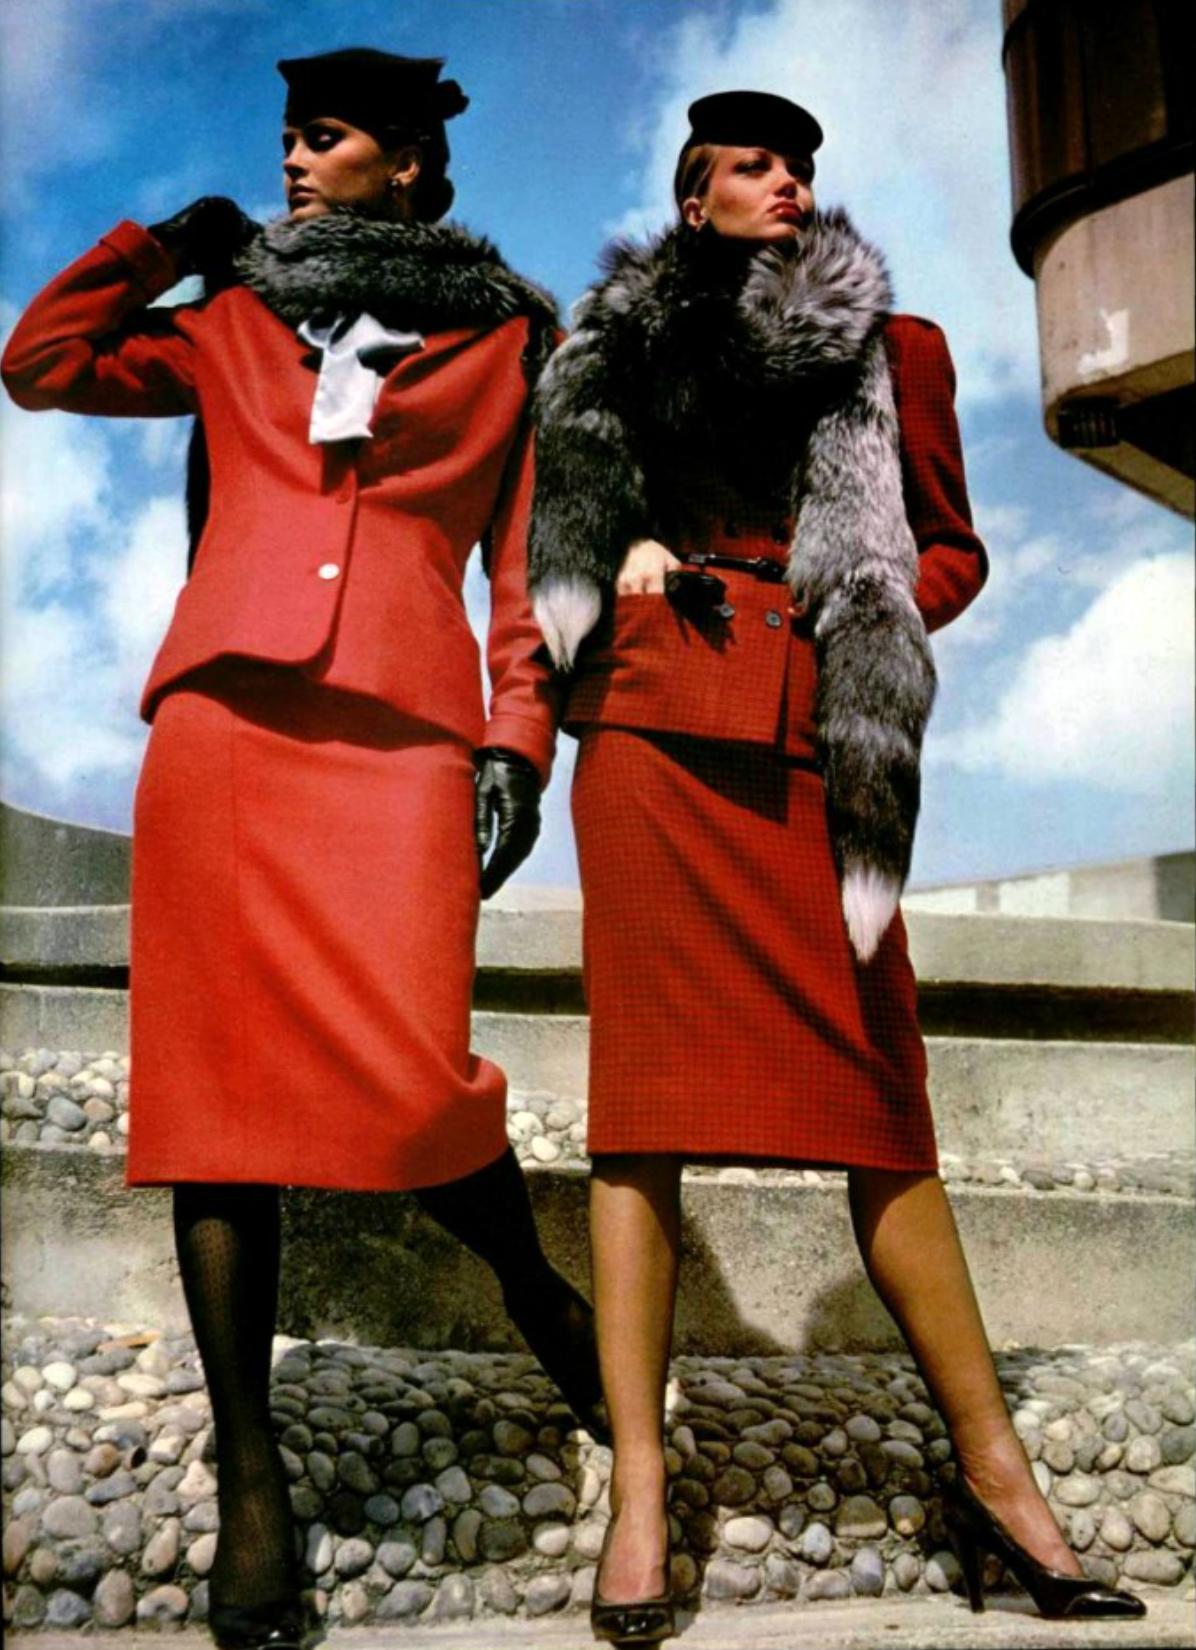 Guy Laroche L'Officiel magazine 1979